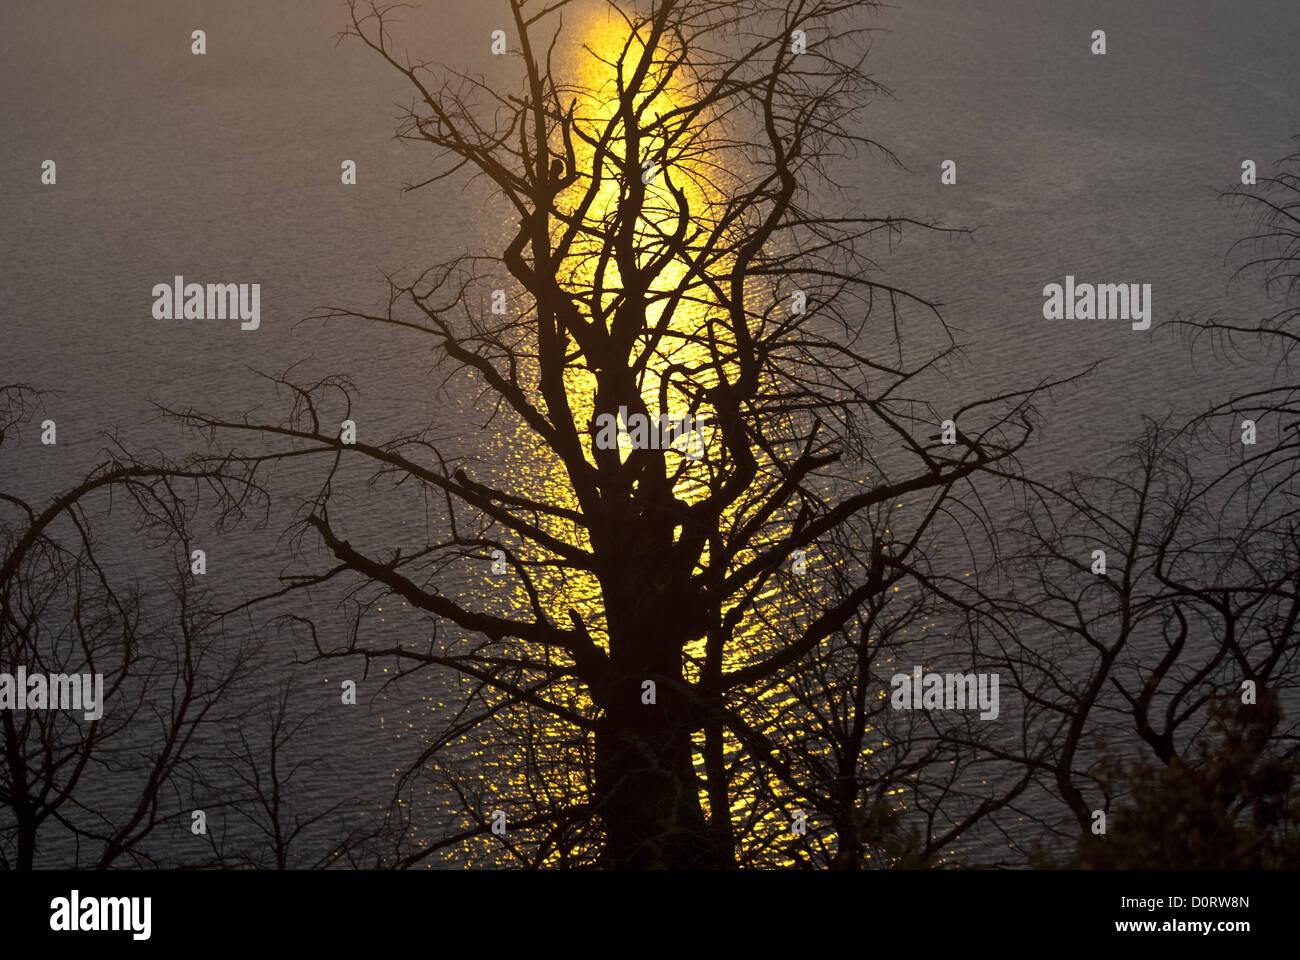 Firey Tree in Evening's Light - Stock Image